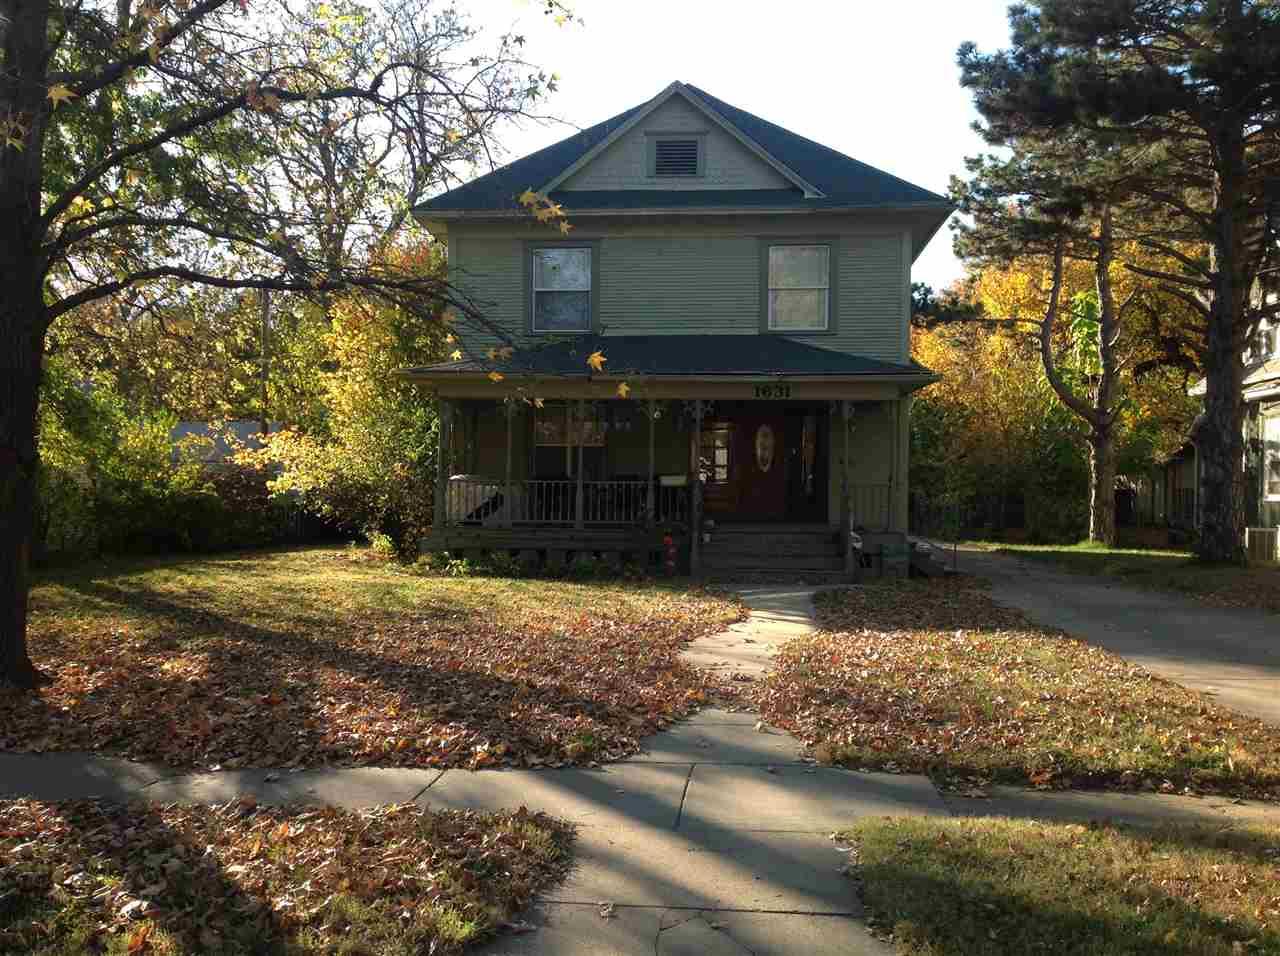 1631 N Fairview, Wichita, KS 67203